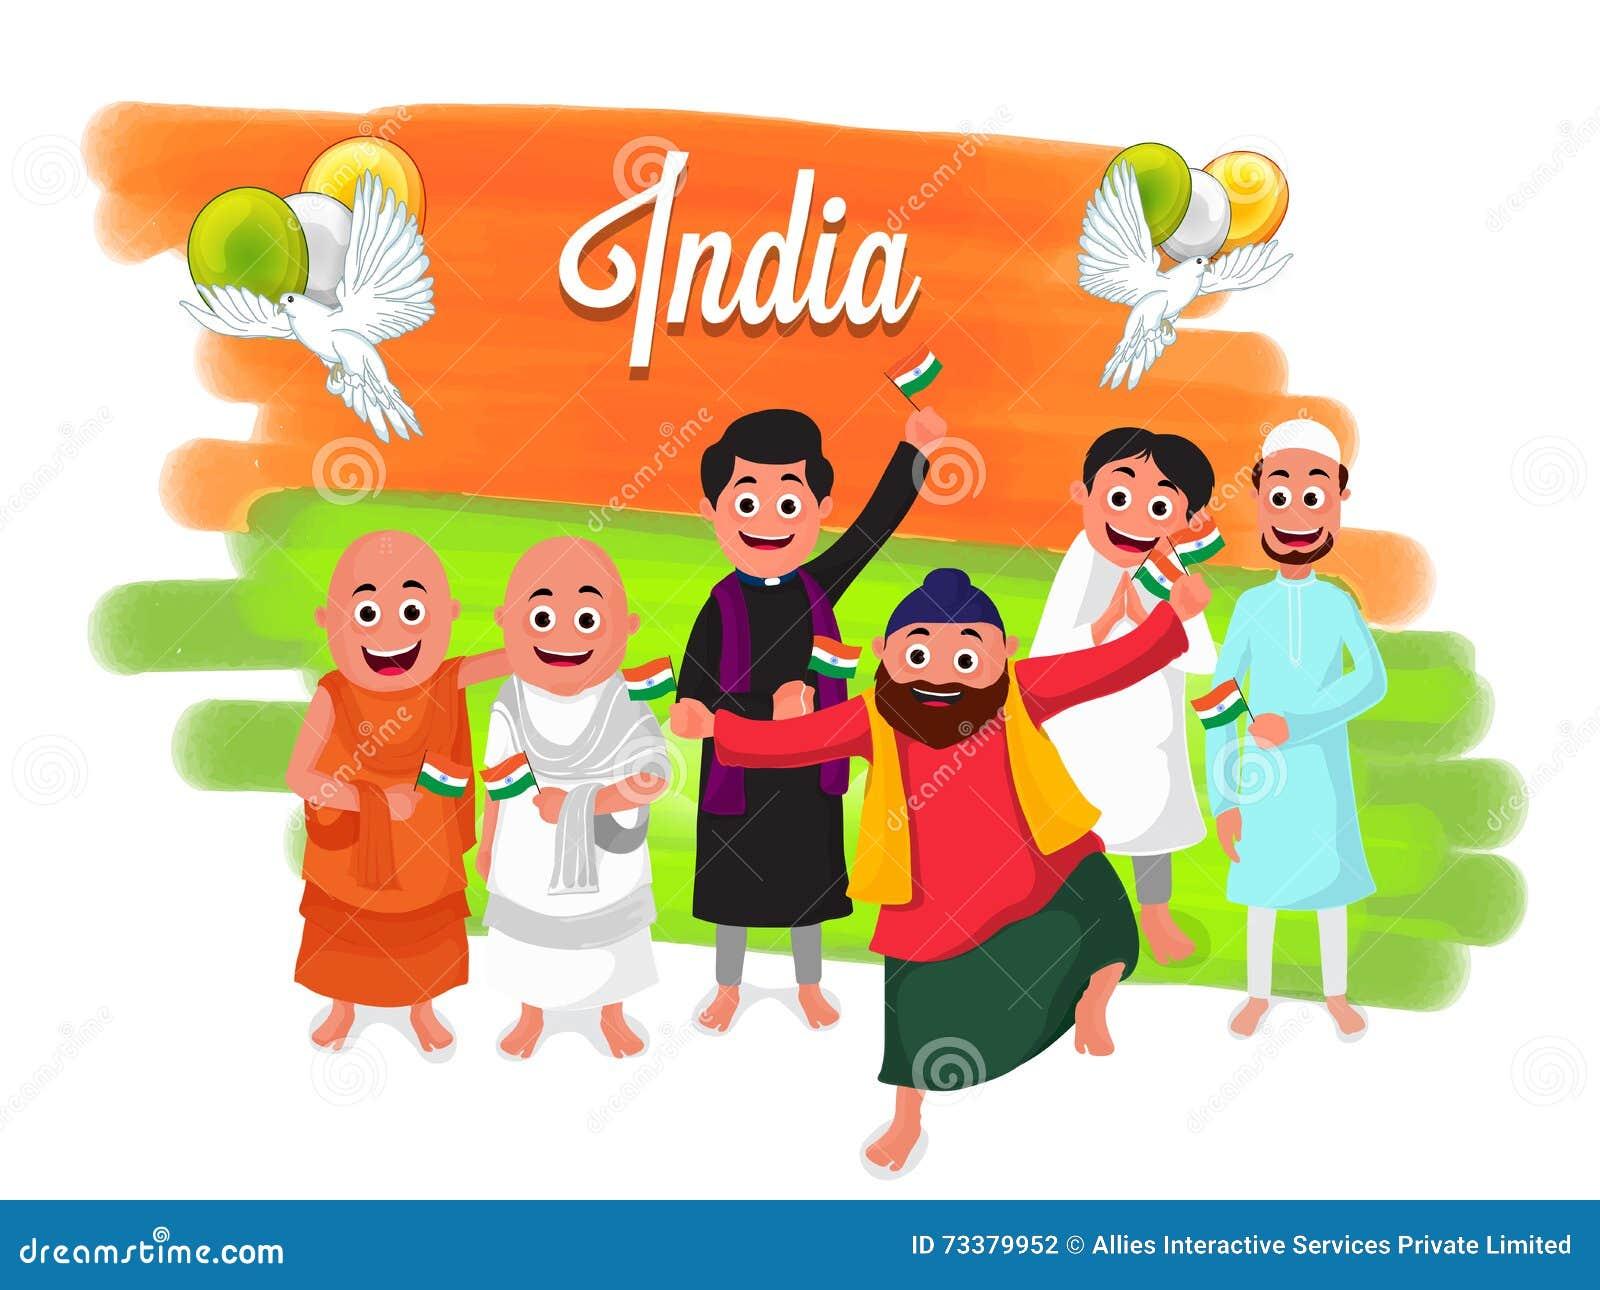 religious diversity in india